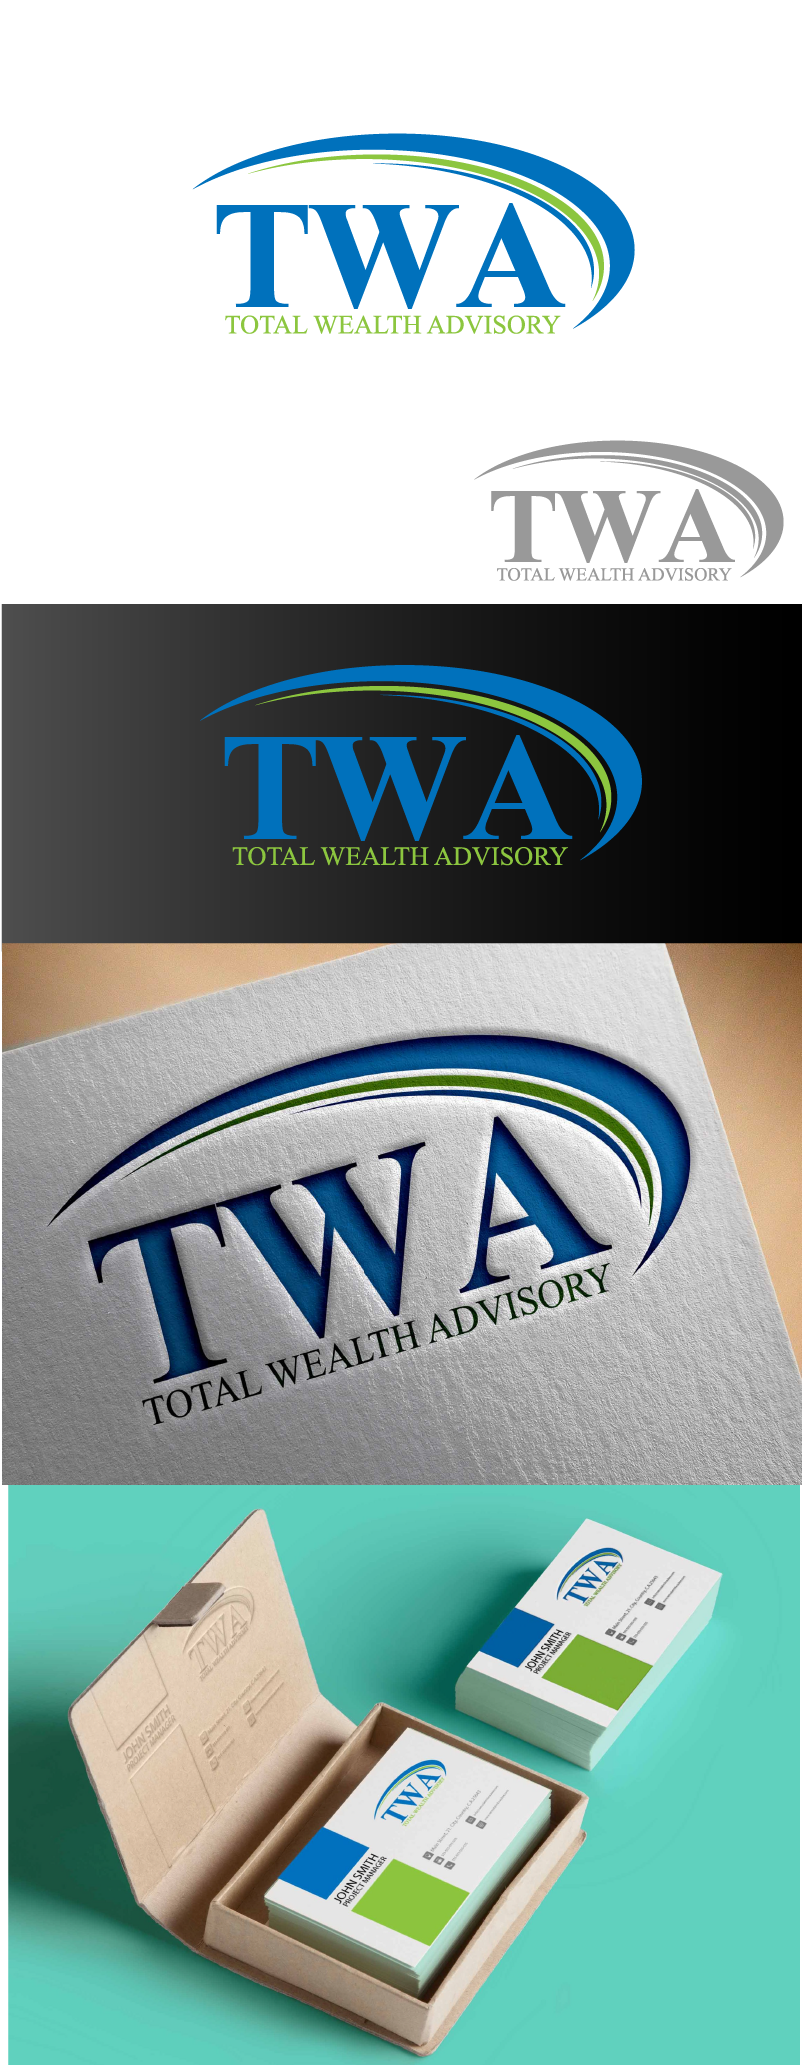 Logo Design by Private User - Entry No. 27 in the Logo Design Contest Imaginative Logo Design for Total Wealth Advisory (TW Advisory).